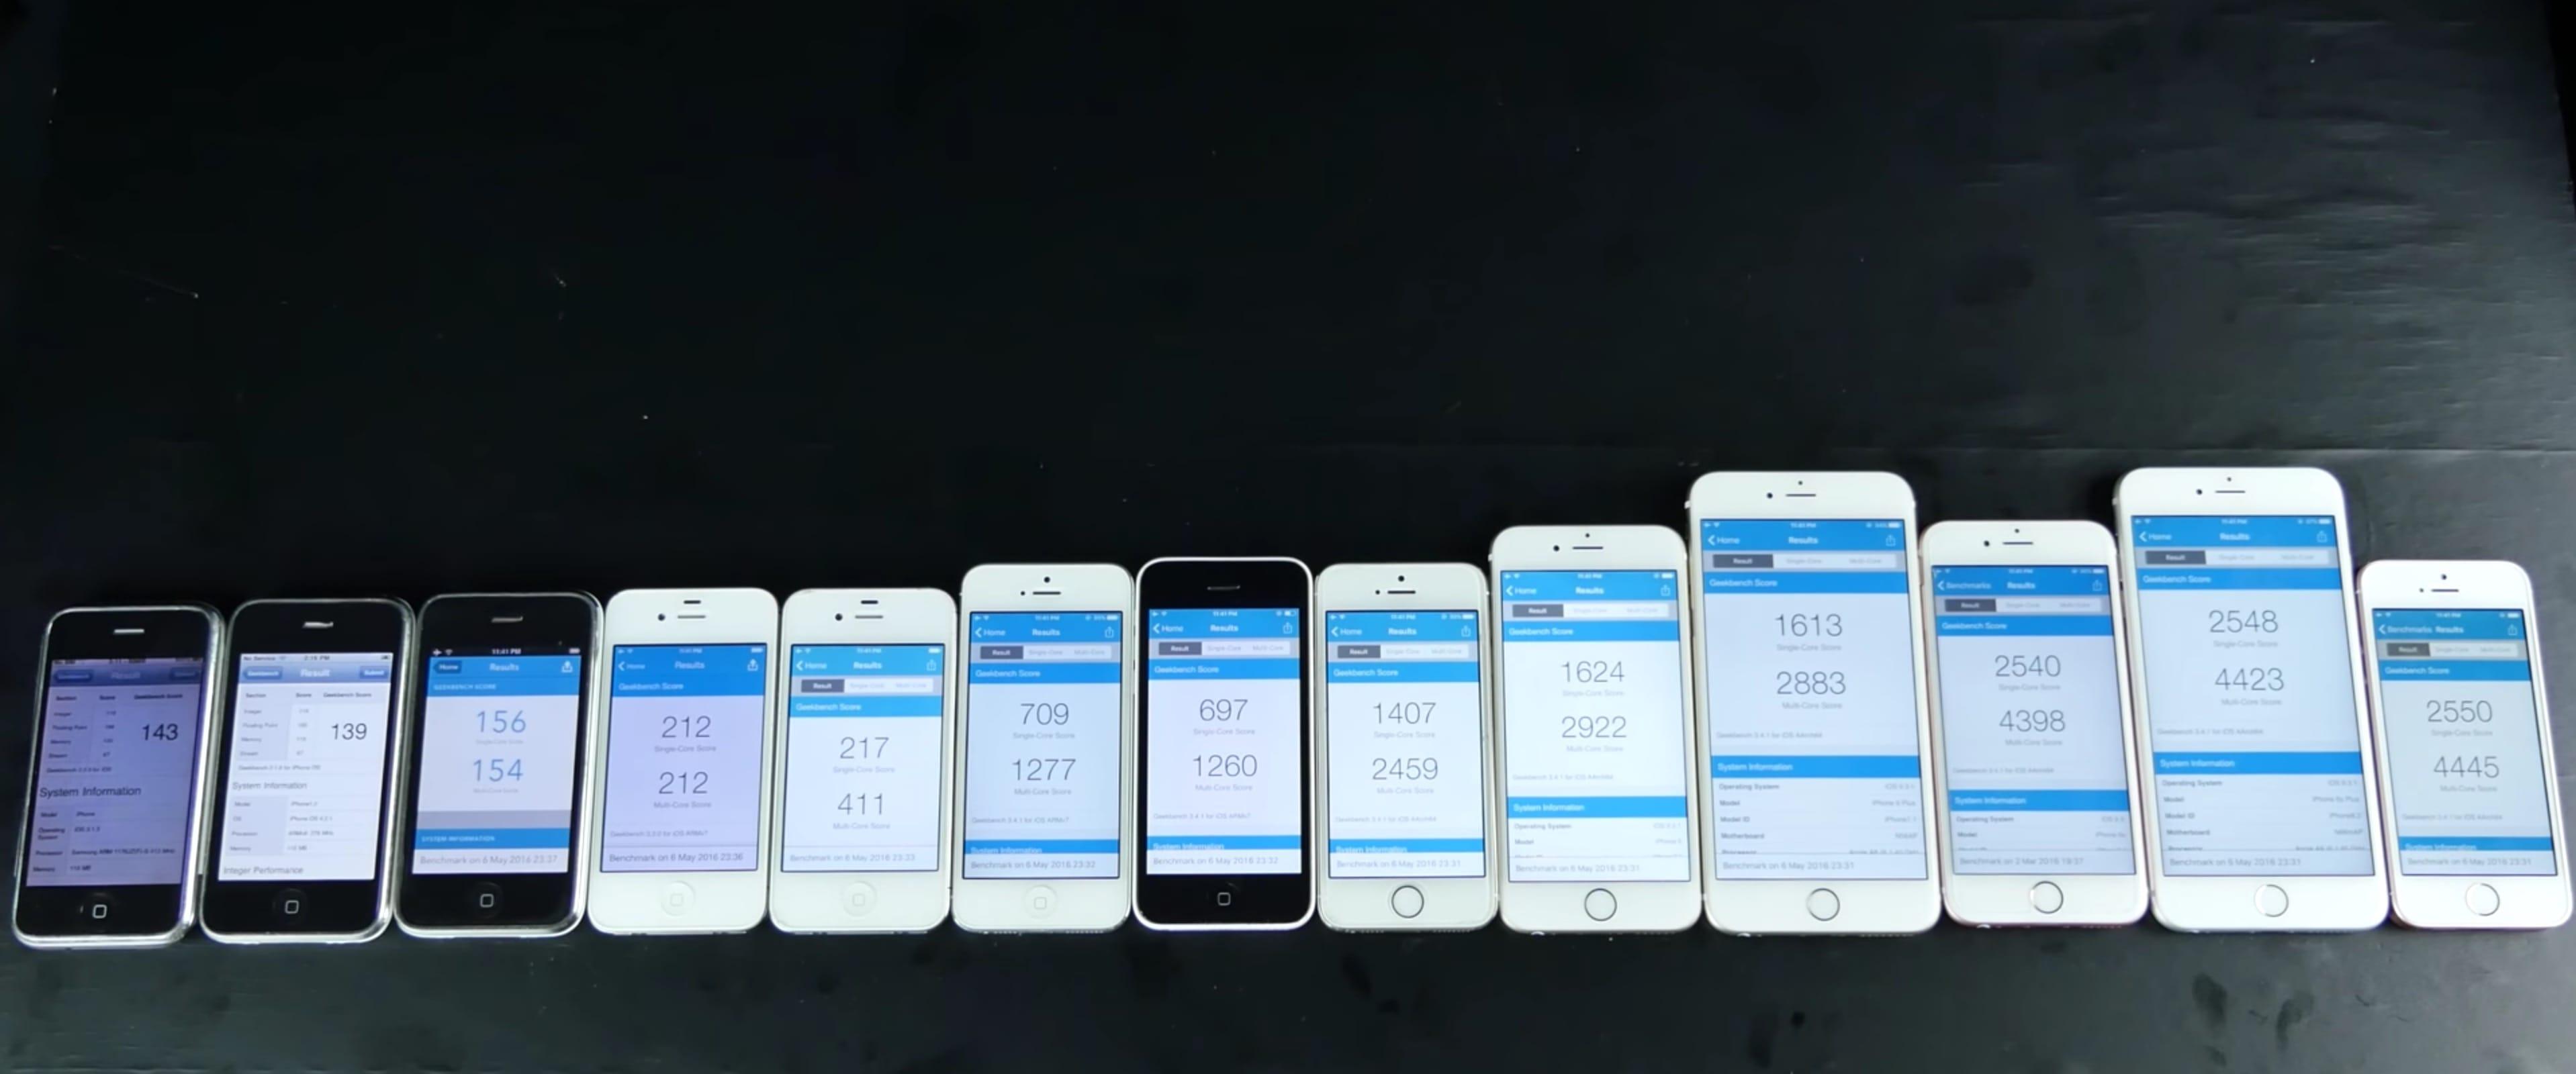 les 13 iphone d 39 apple dans un comparatif g ant igeneration. Black Bedroom Furniture Sets. Home Design Ideas